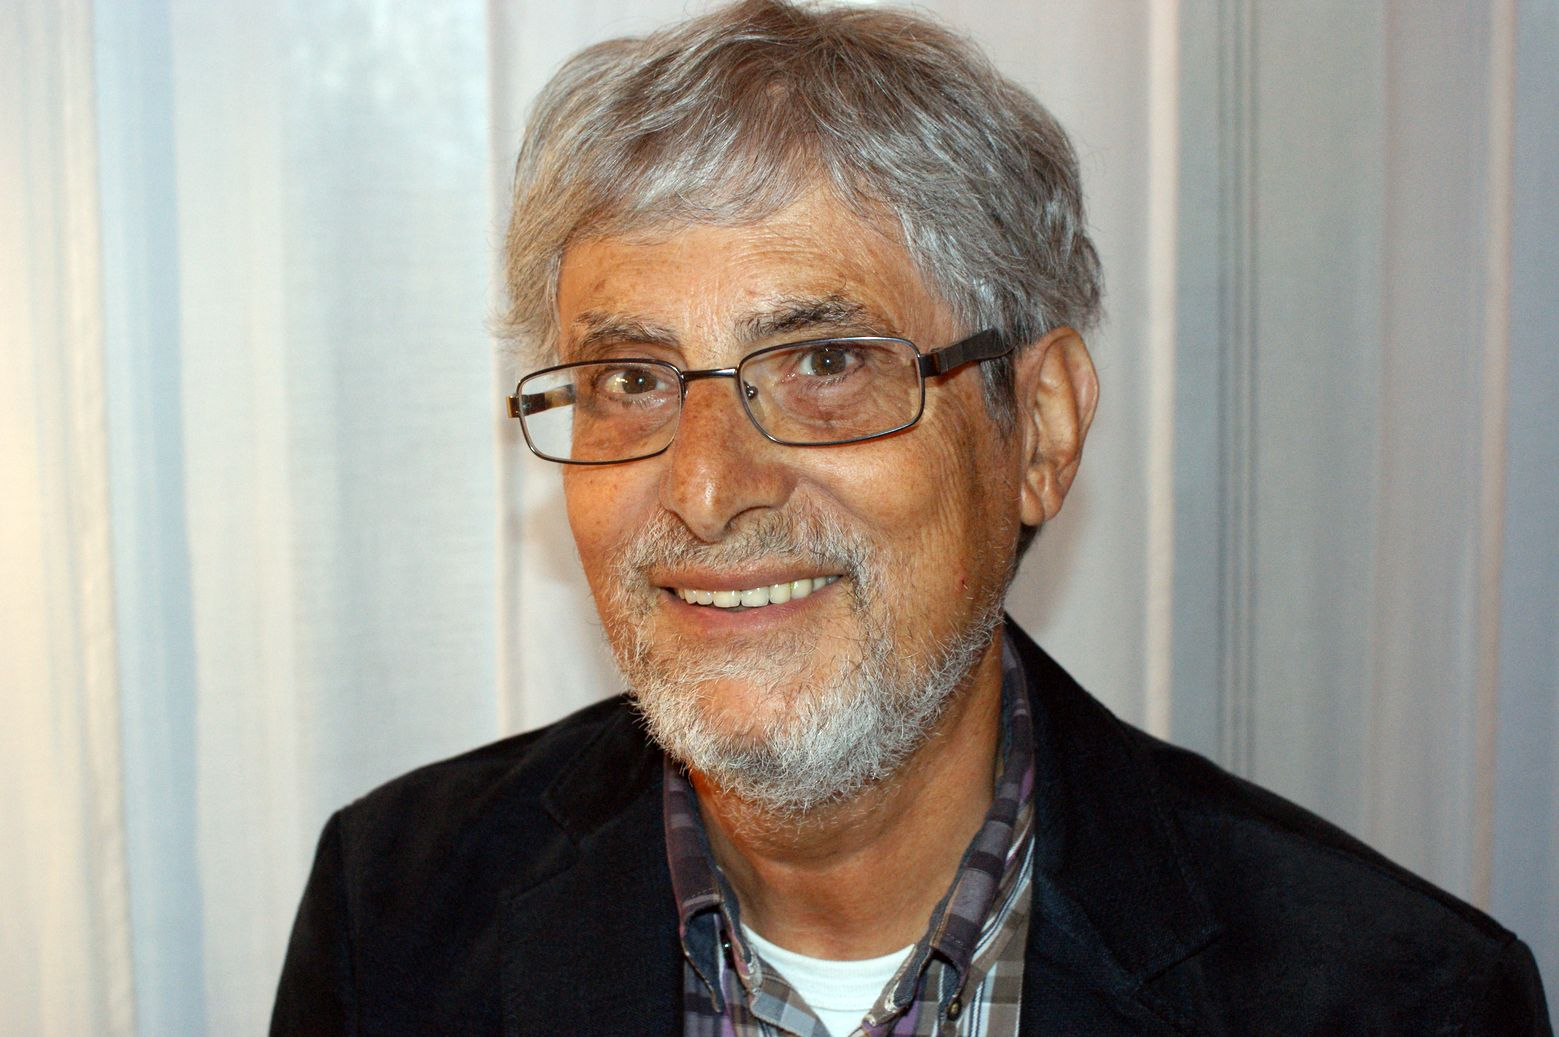 Dr. Wilfried Huck